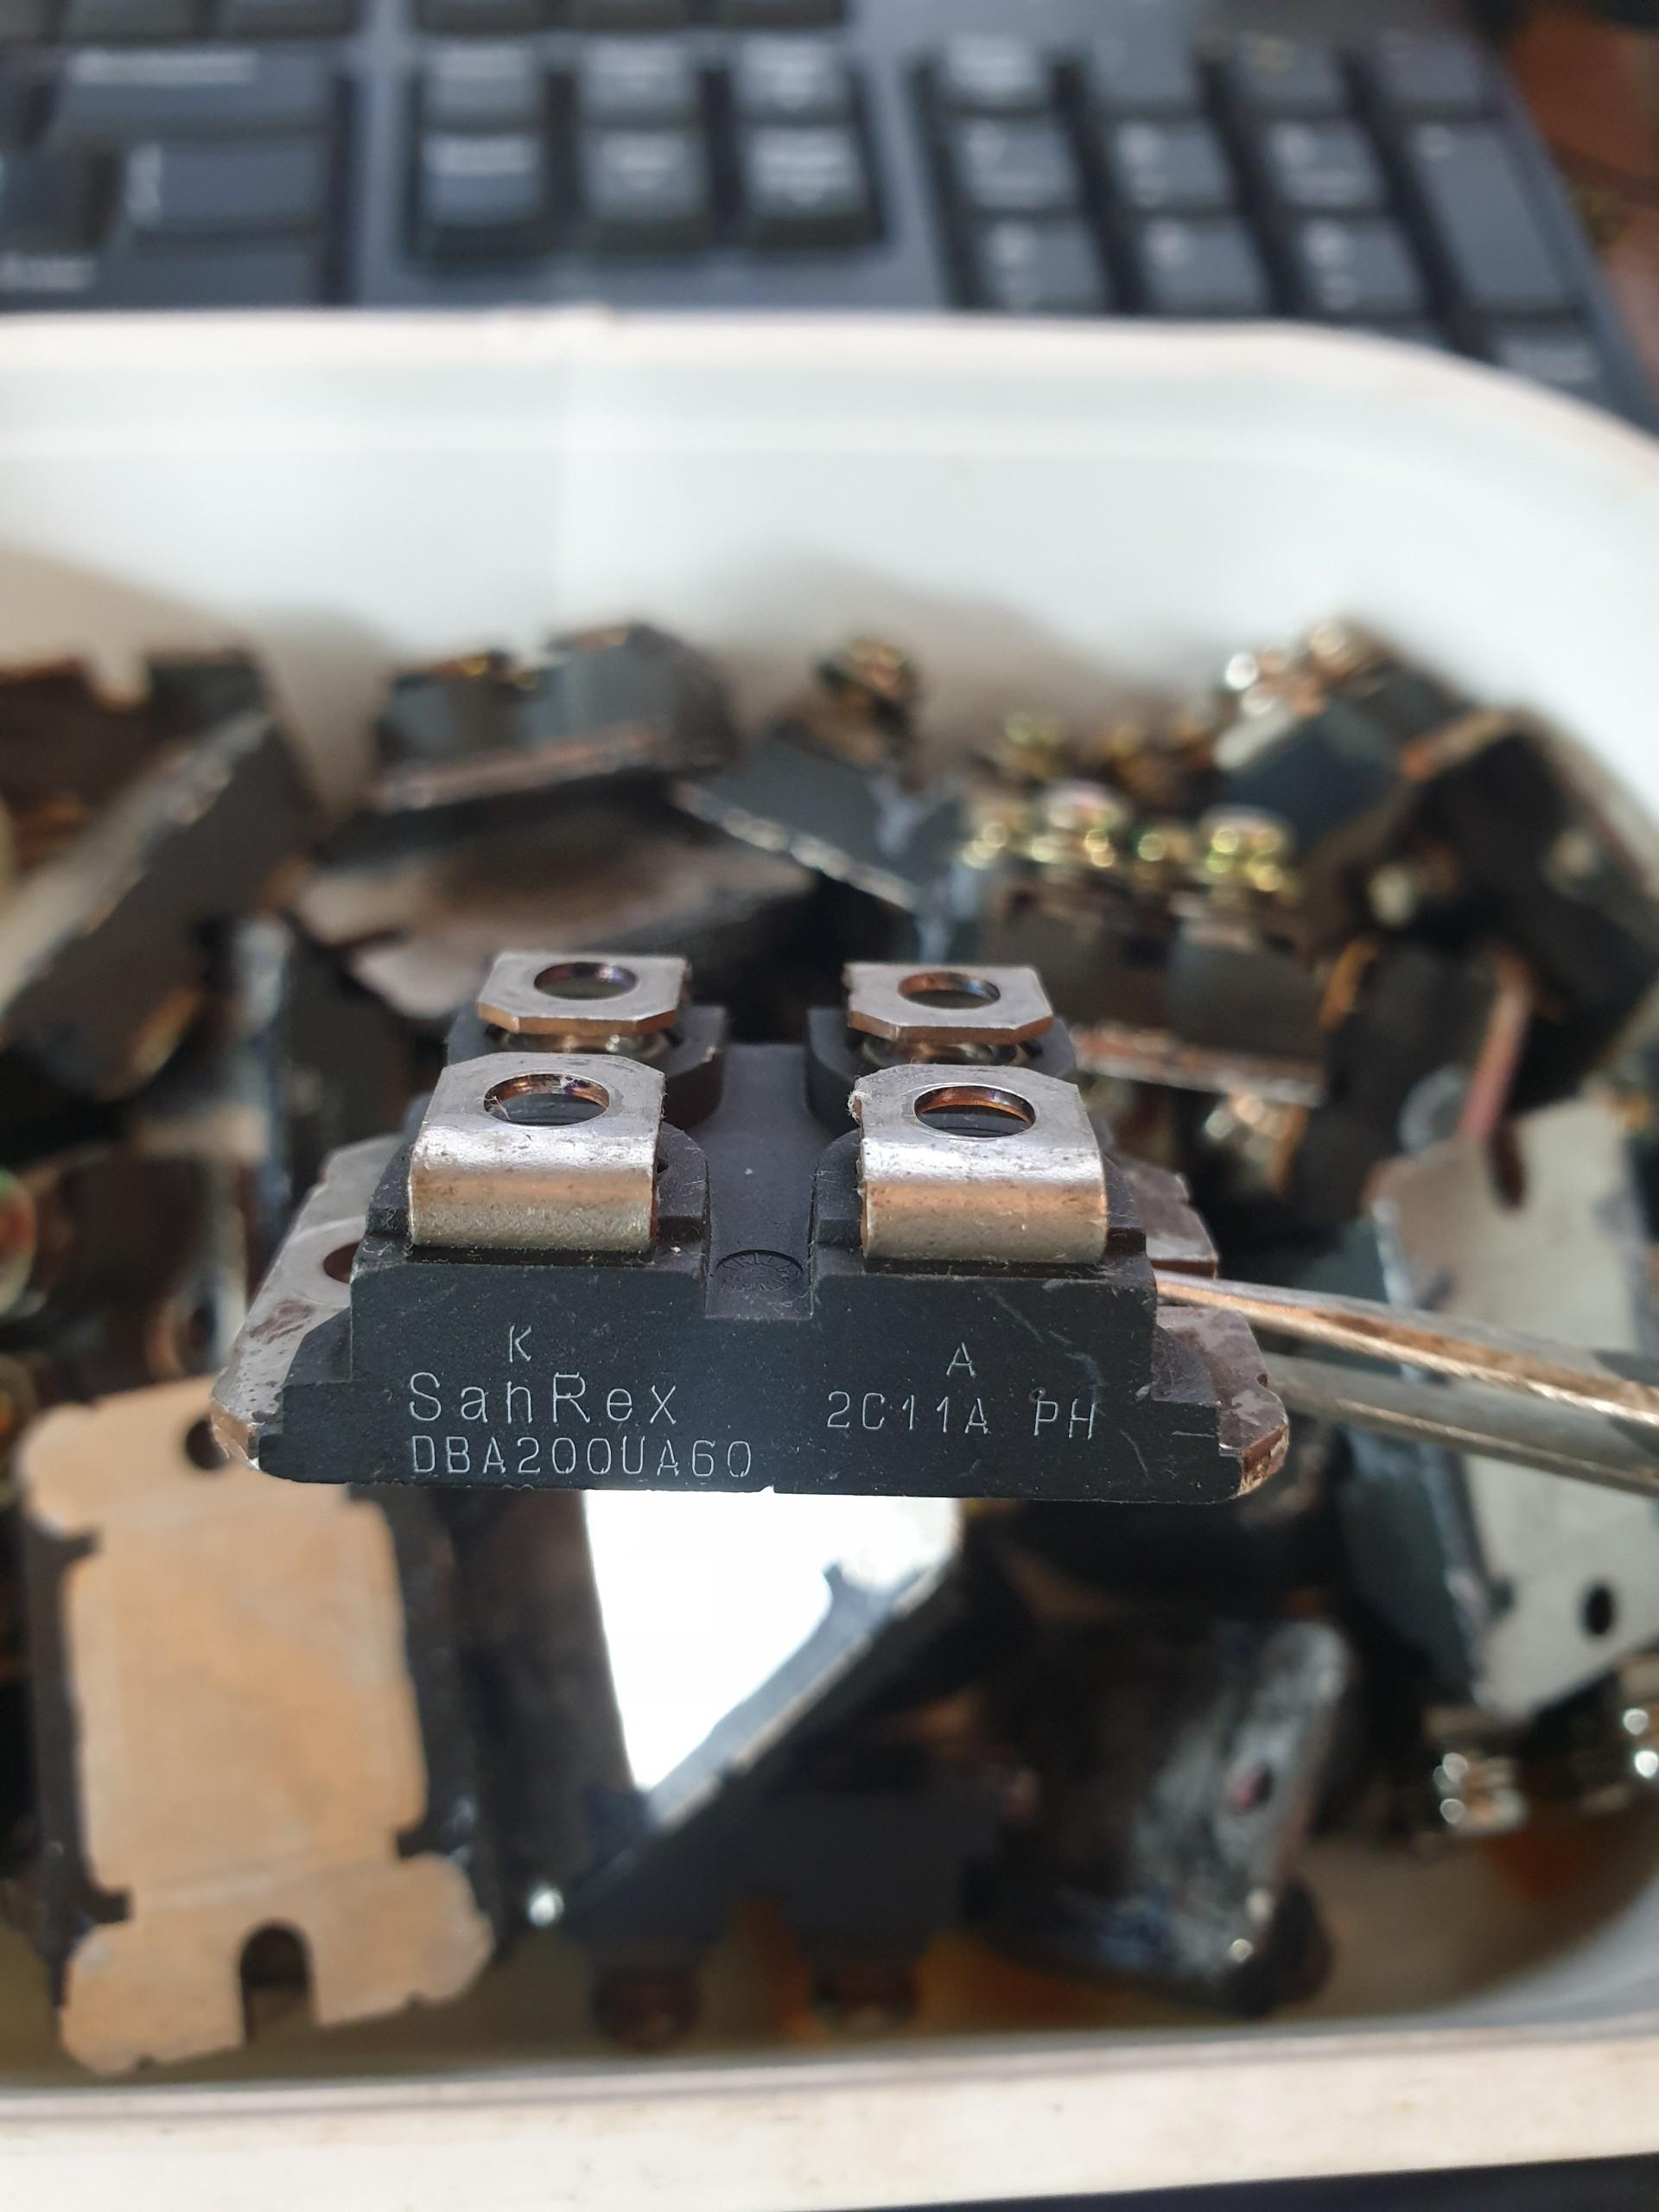 dba200ua60-diode-200a-600v